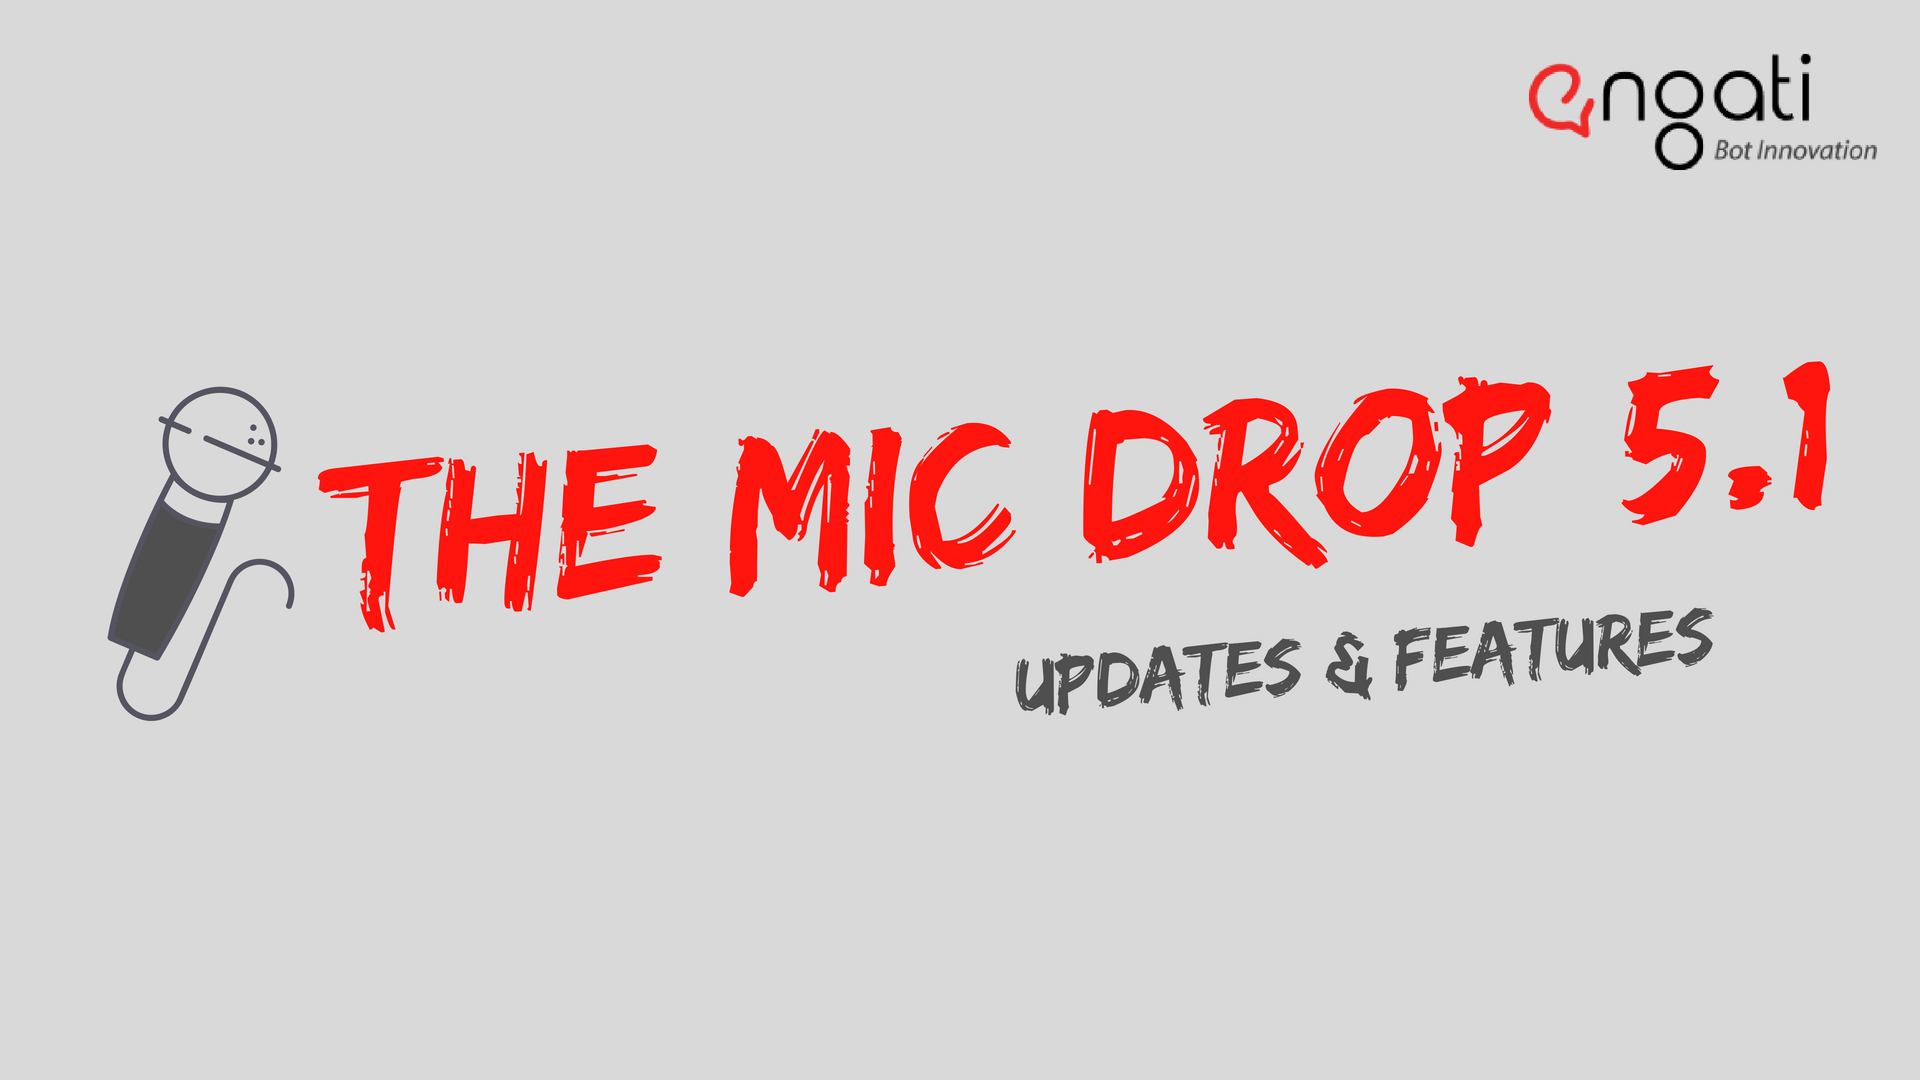 mic drop 5.1